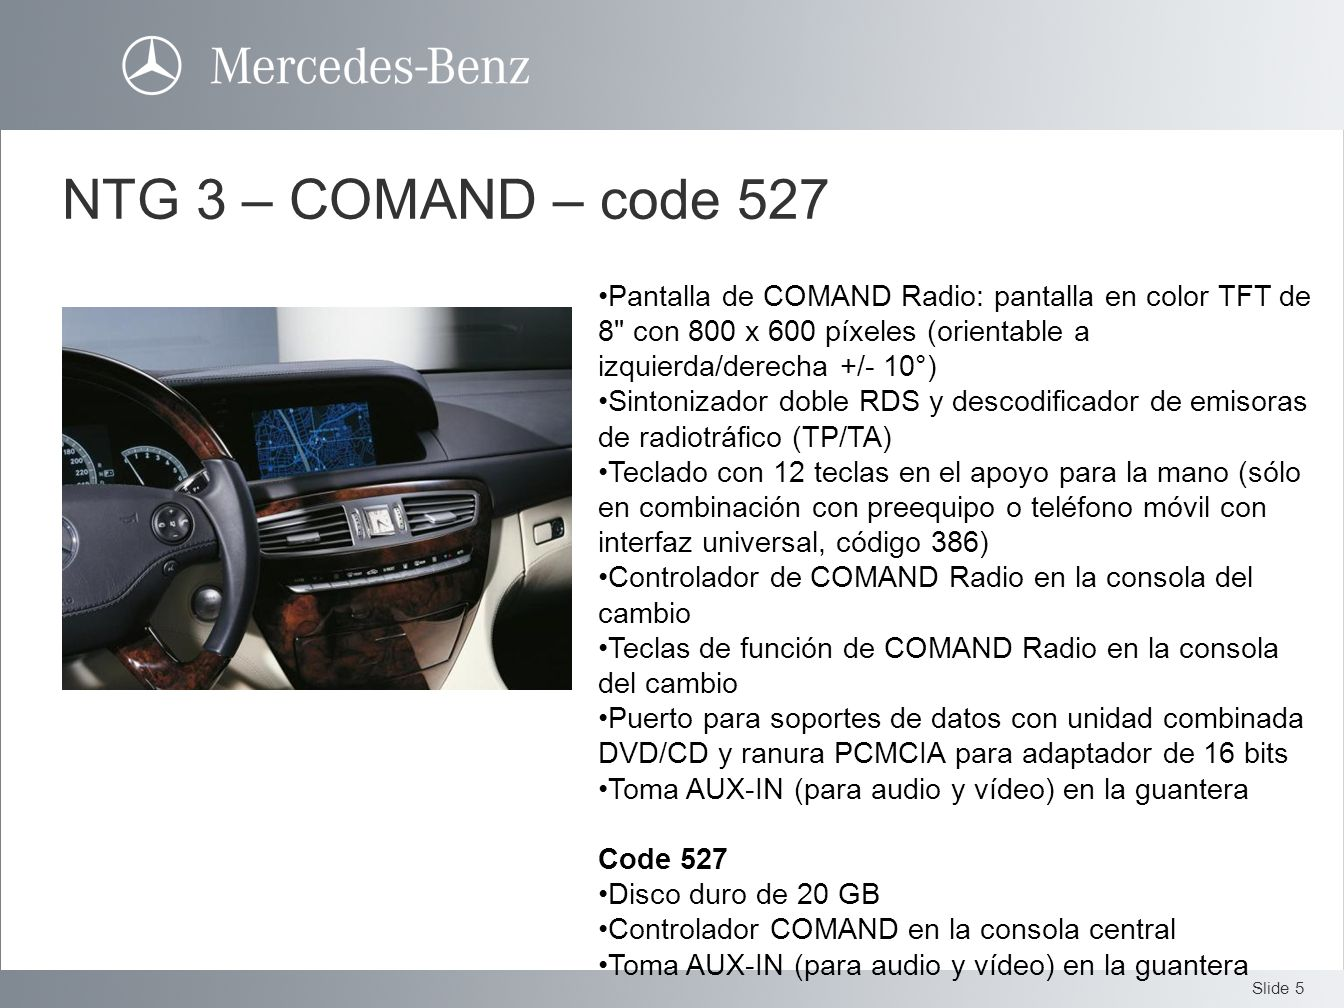 NTG 3 – COMAND – code 527Pantalla de COMAND Radio: pantalla en color TFT de 8 con 800 x 600 píxeles (orientable a izquierda/derecha +/- 10°)